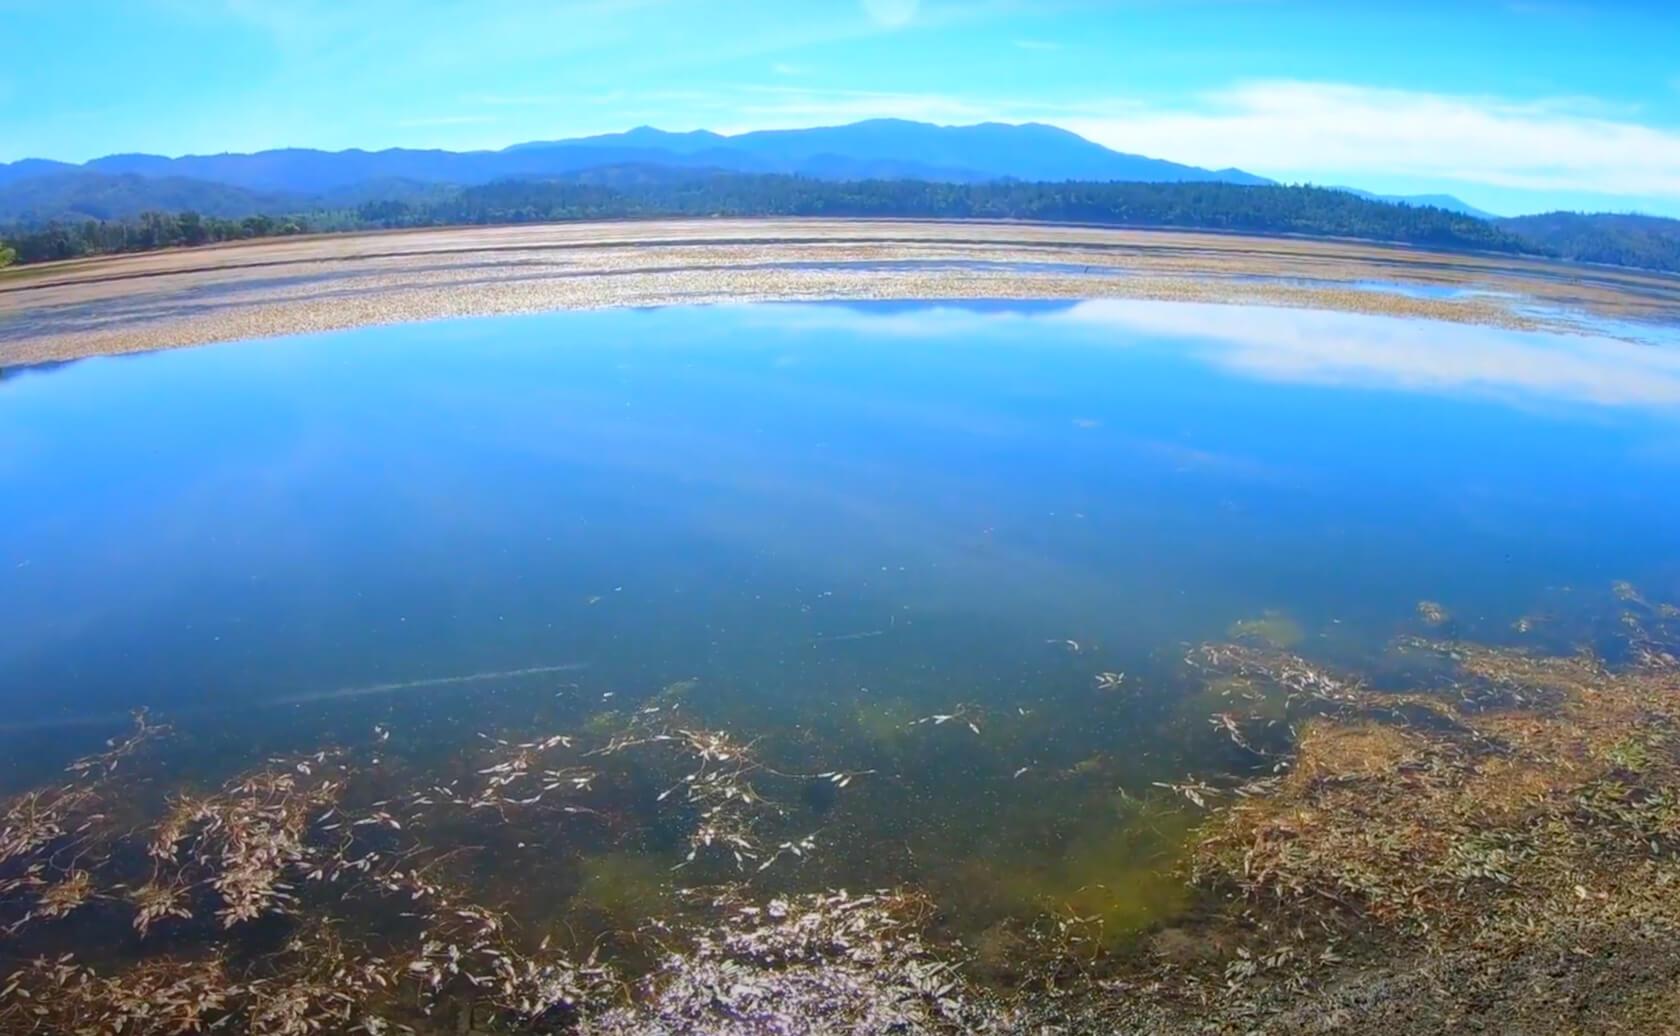 Pillsbury-Lake-Fishing-Guide-Report-California-03